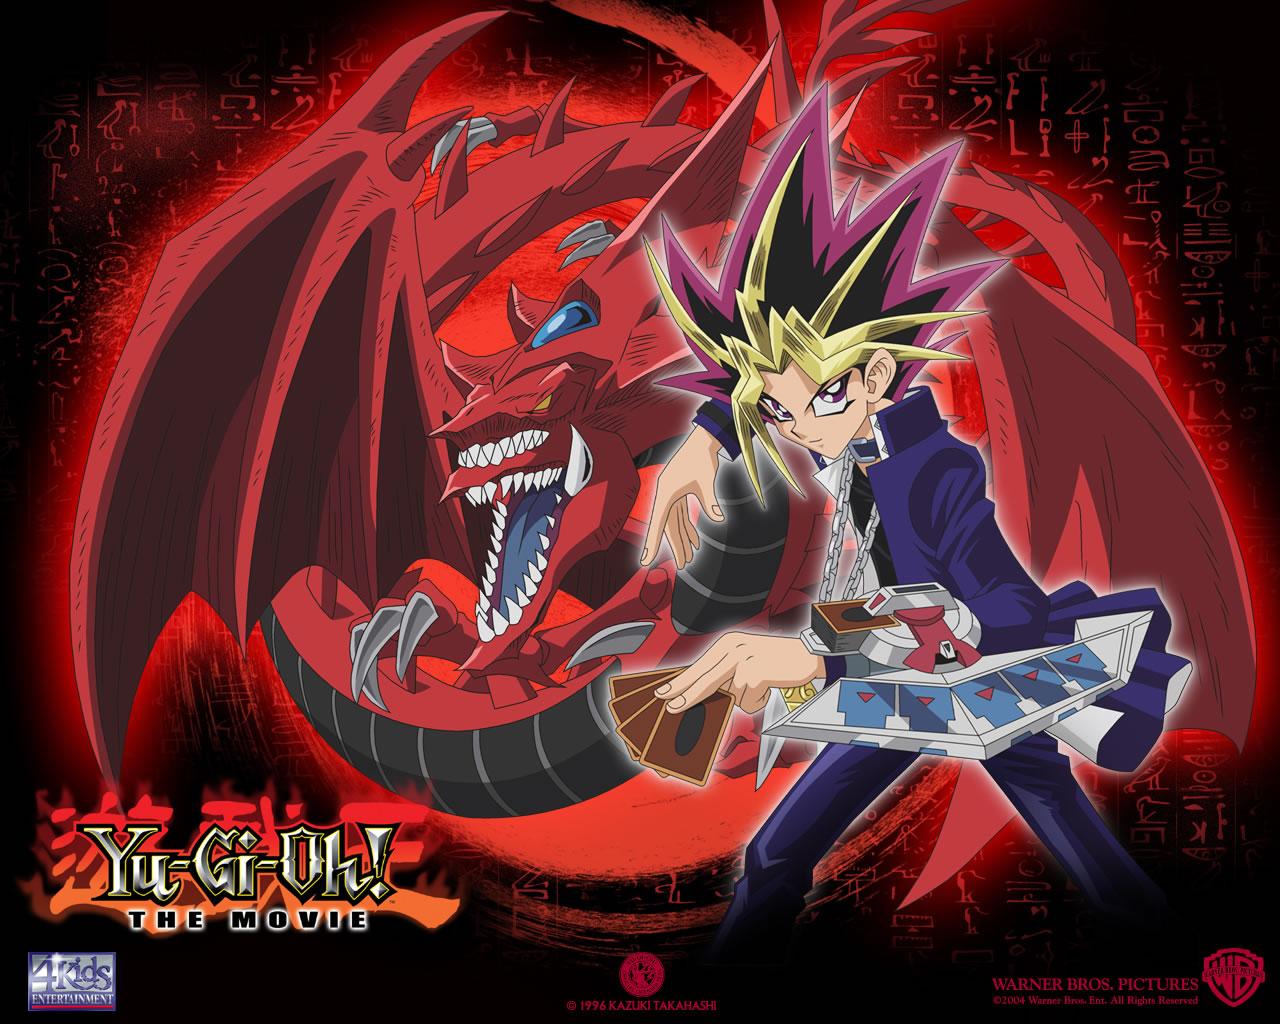 Yu Gi Oh Monster Master Wallpaper   Anime HD Wallpapers 1280x1024